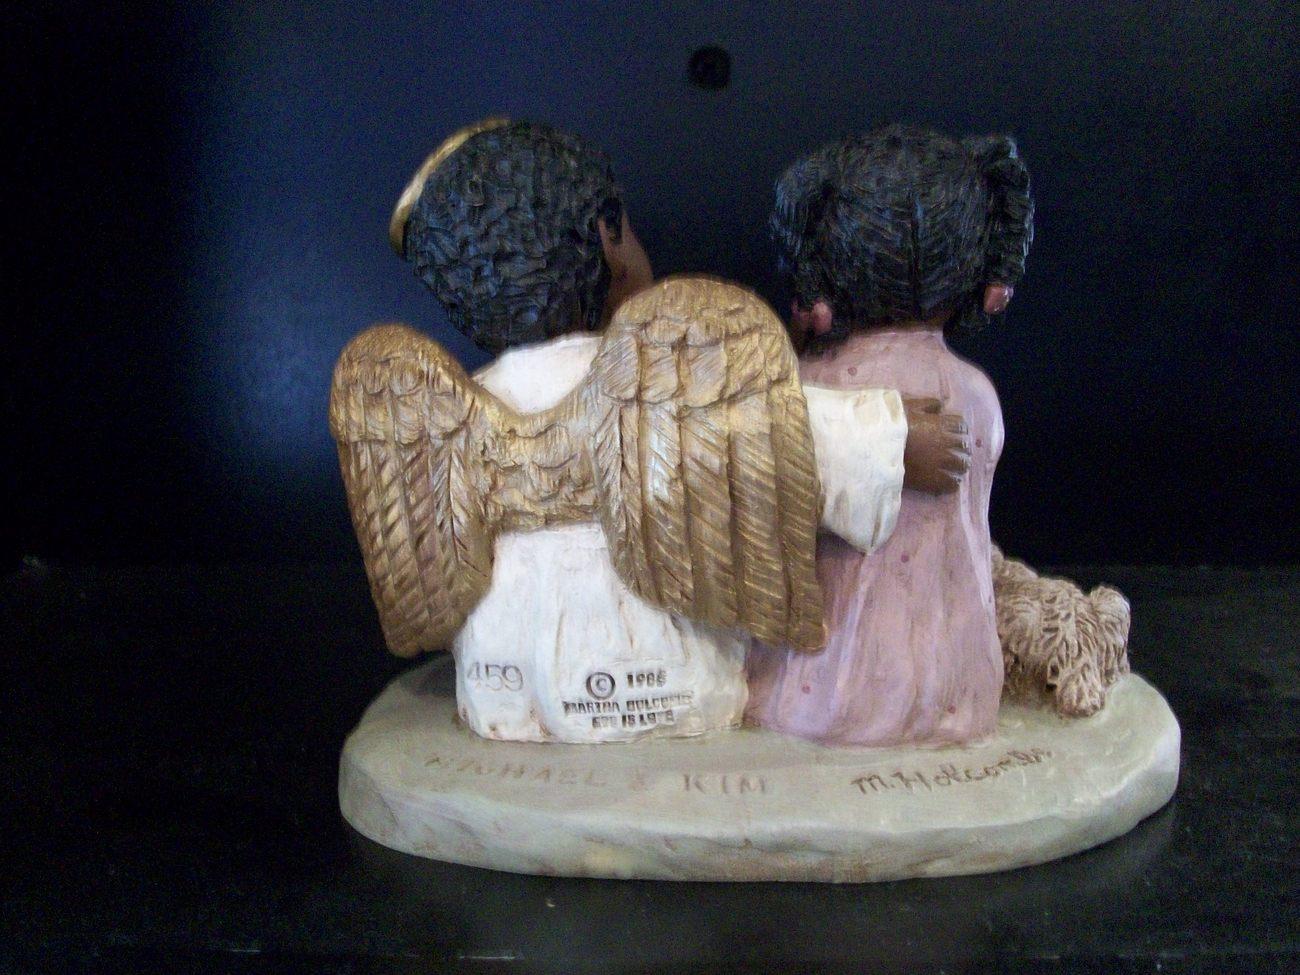 All God's Children - Michael & Kim, Angel and Girl, Item #1517, New in Box w/COA